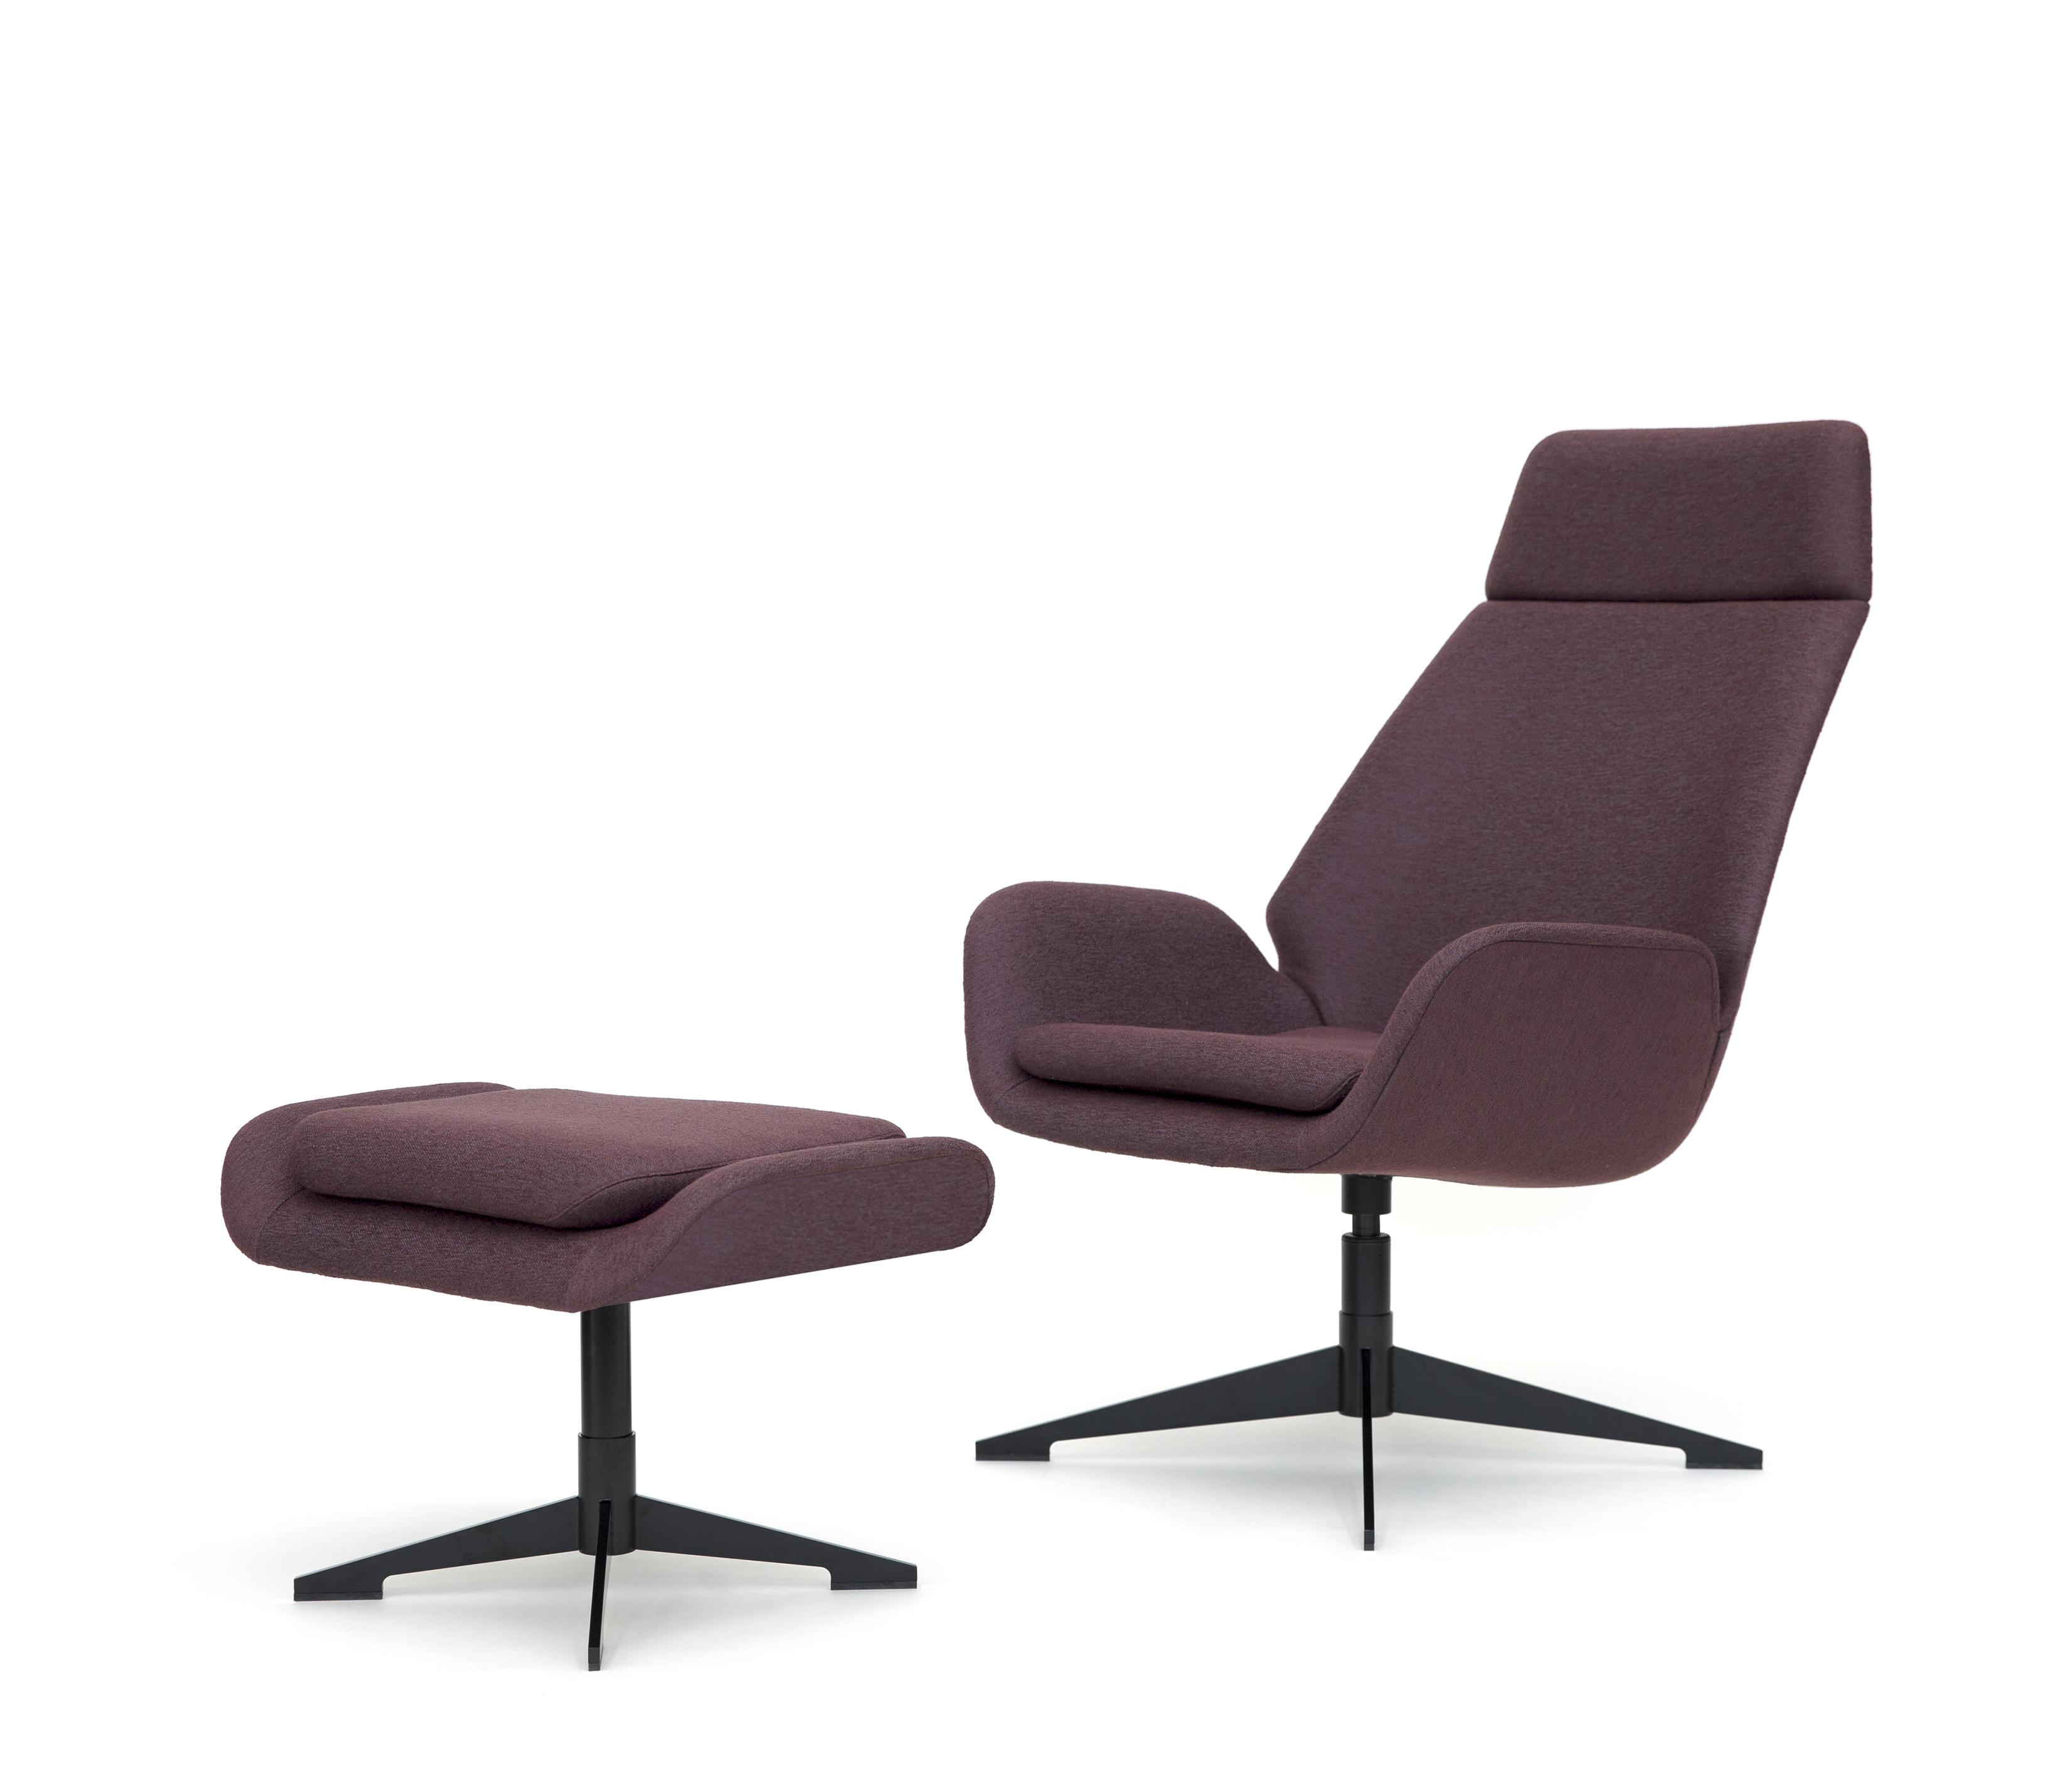 Marvelous Conexus By Hbf Archello Beatyapartments Chair Design Images Beatyapartmentscom